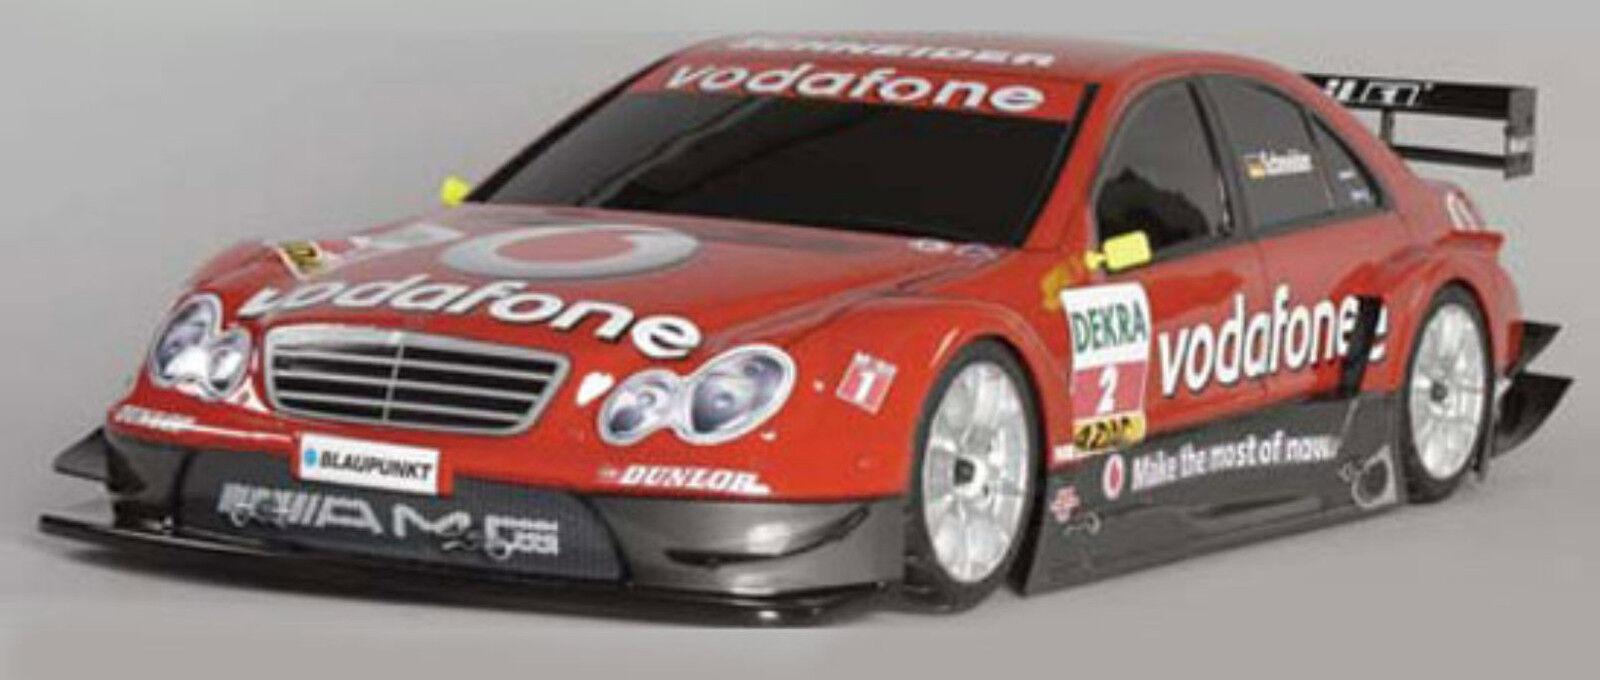 FG modelo Sport r 4wd 530 rtr chasis lacados mercedes verbrenner